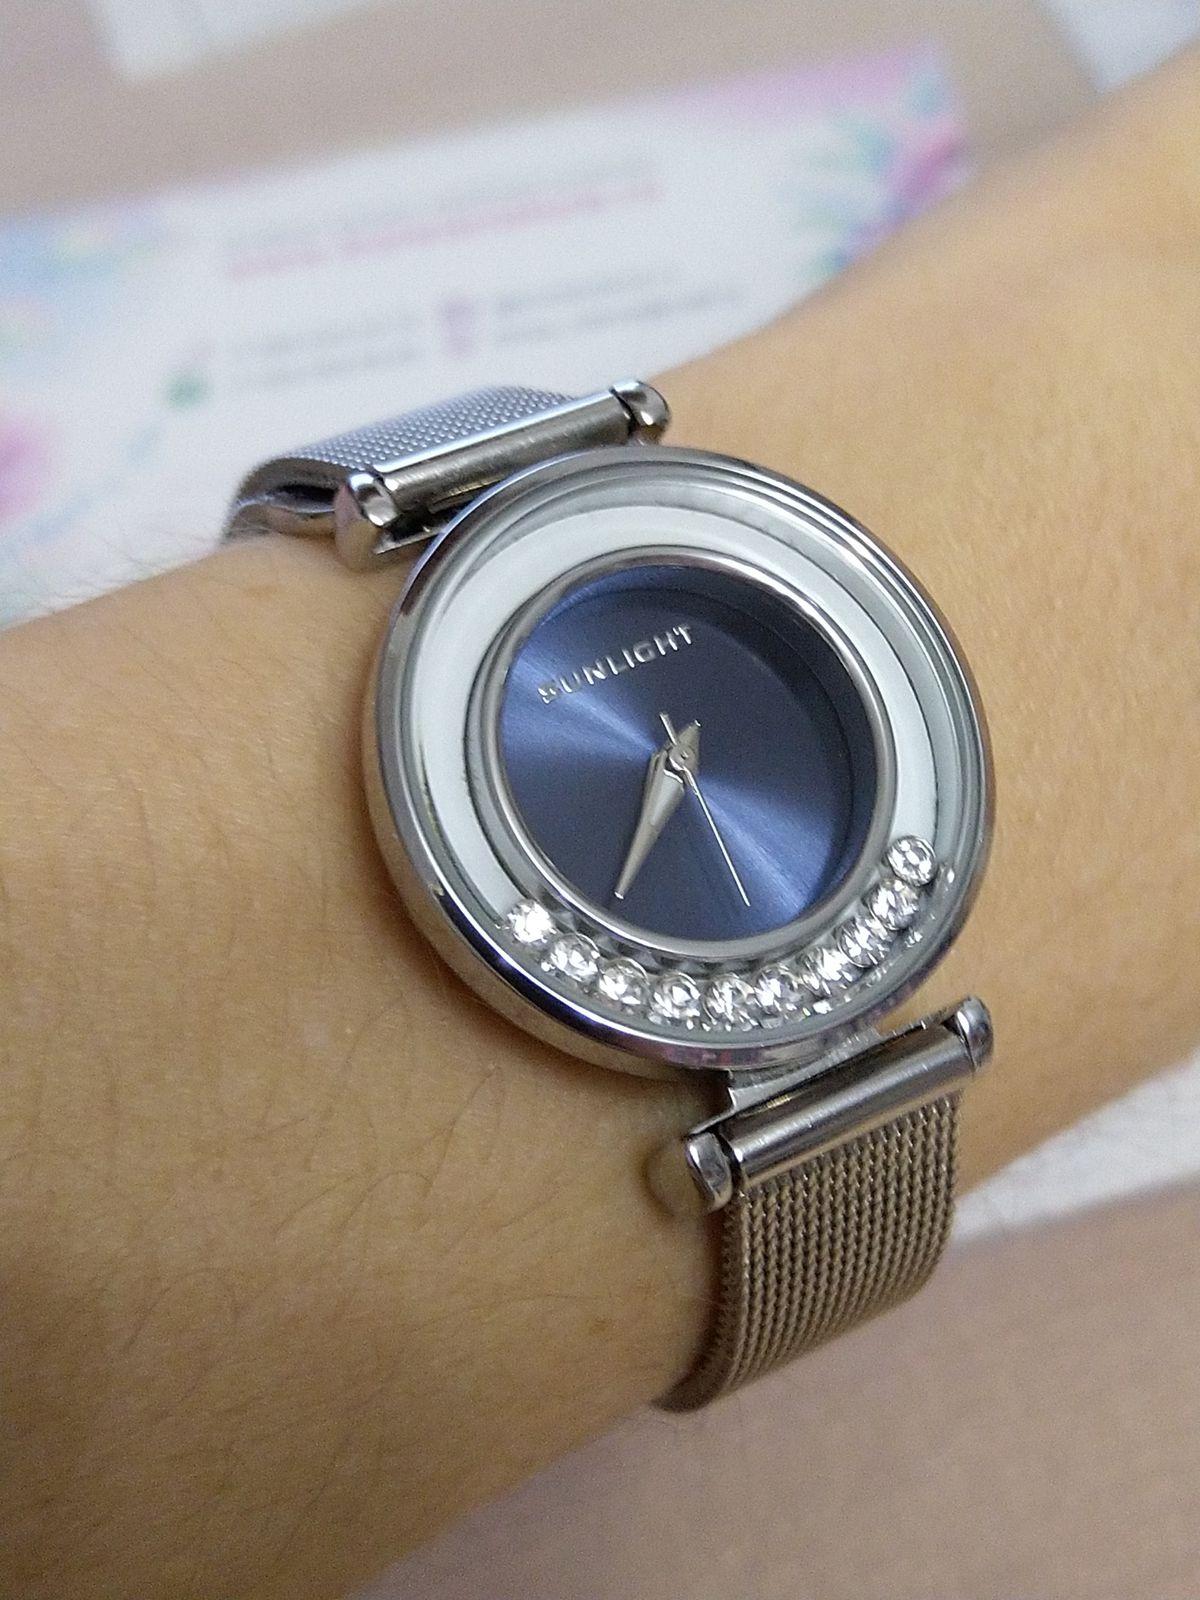 Супер часы, удобные и надёжные!